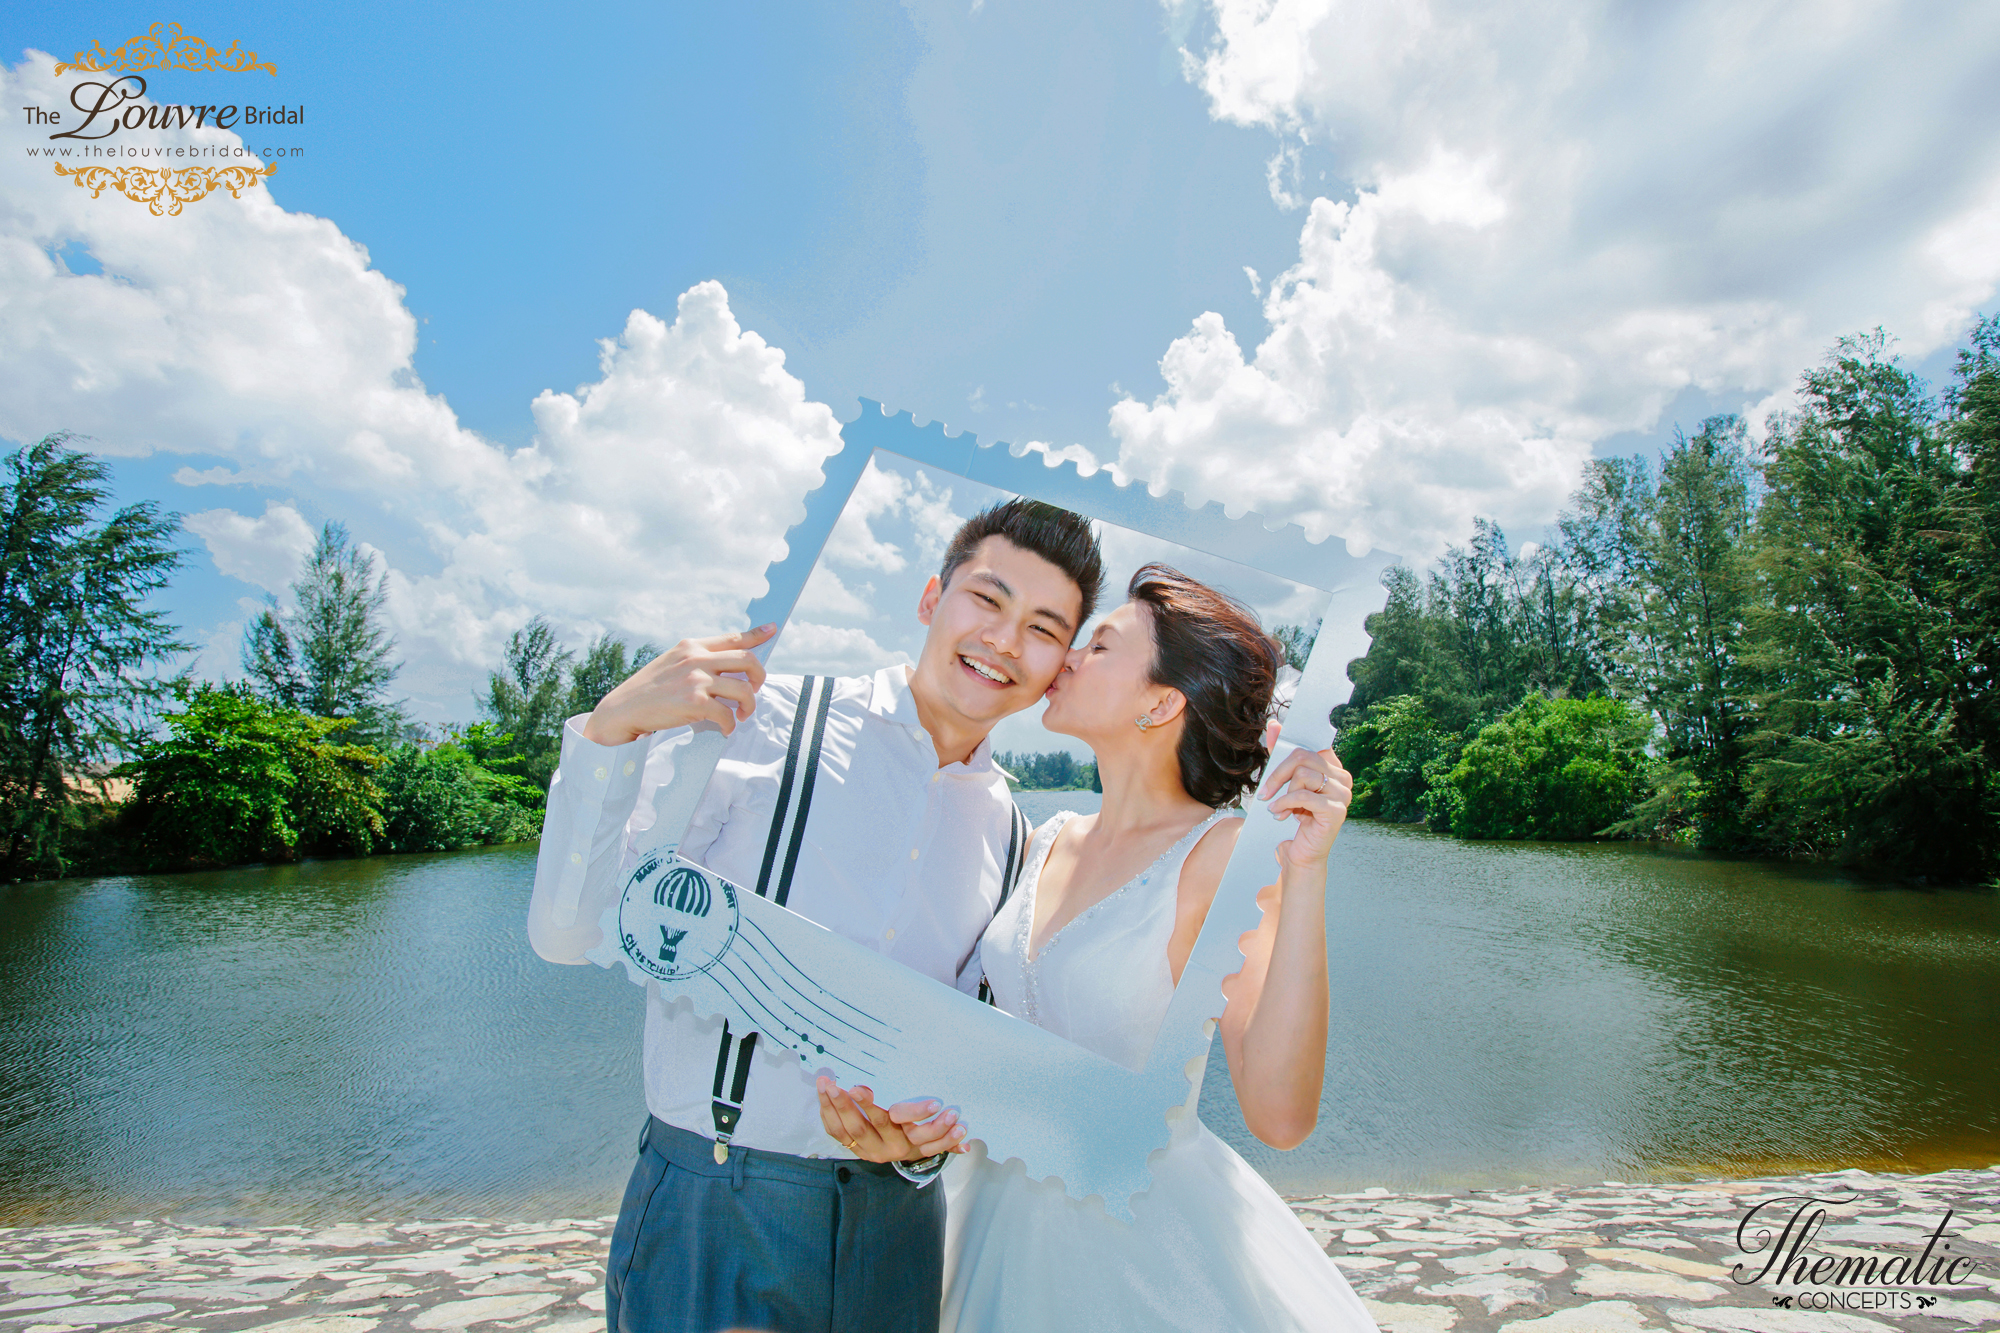 Styled Wedding Photoshoot Travel Theme for your Singapore